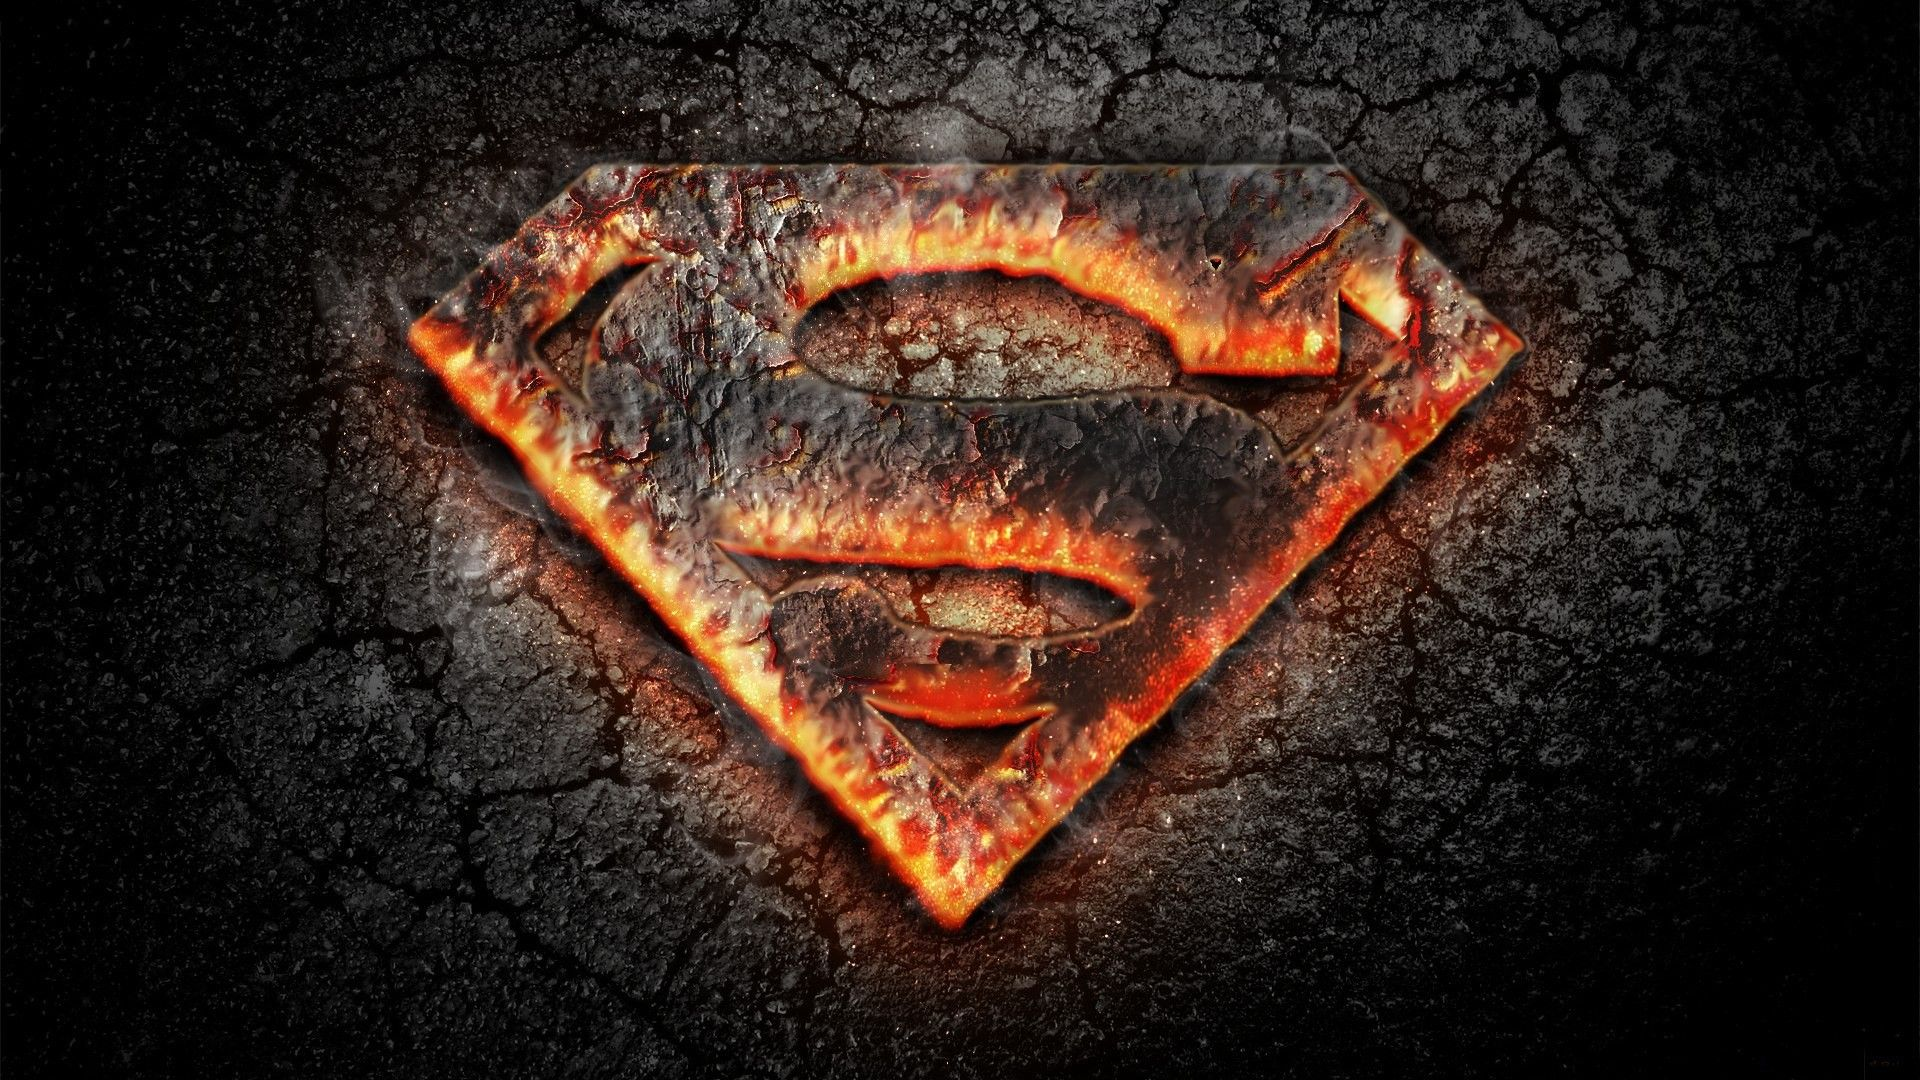 Hd wallpaper superman - Superman Wallpapers Best Wallpapers 1912 1009 Wallpaper Superman 41 Wallpapers Adorable Wallpapers